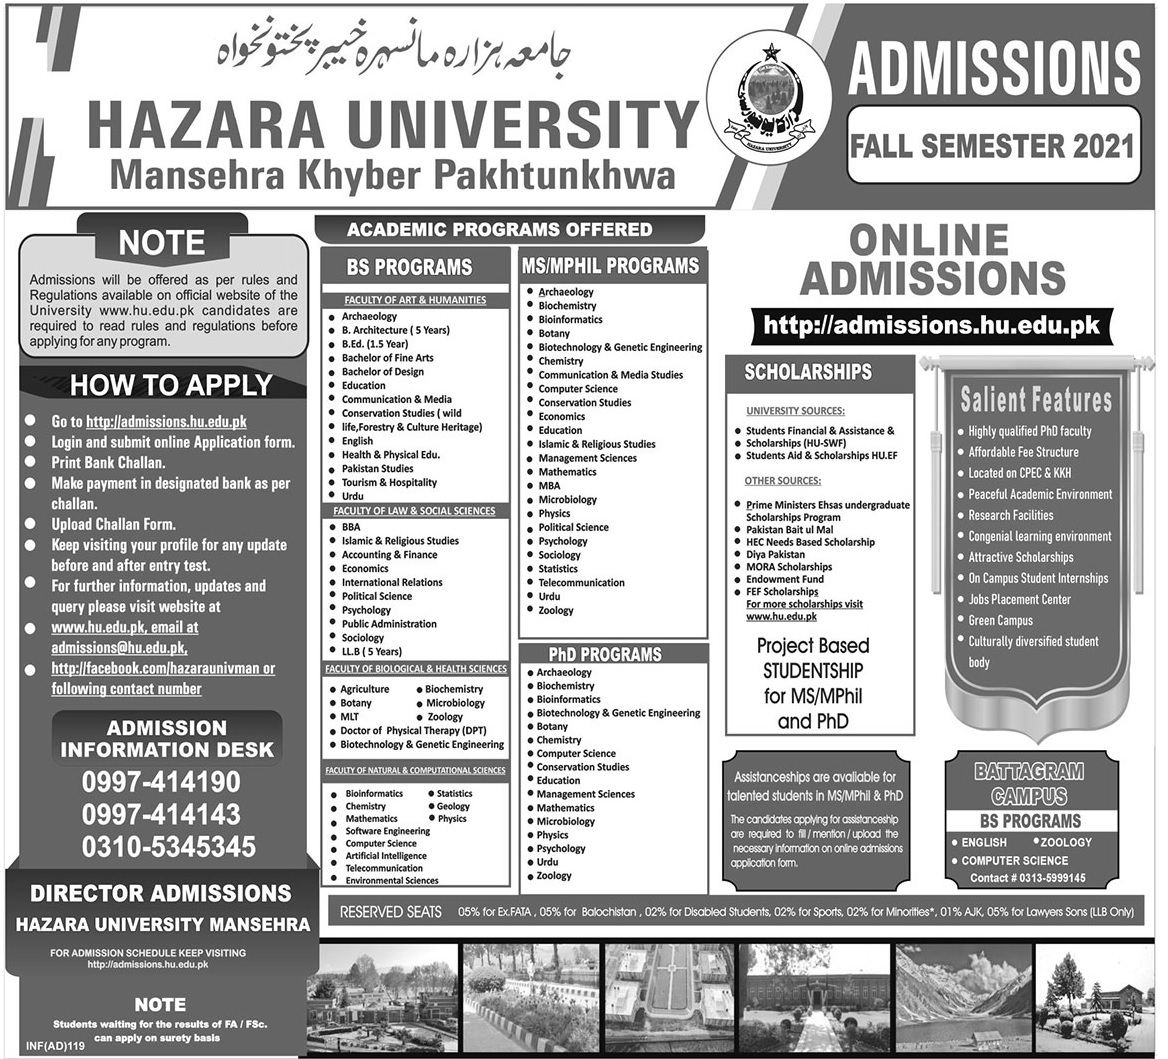 Hazara University Mansehra Admissions